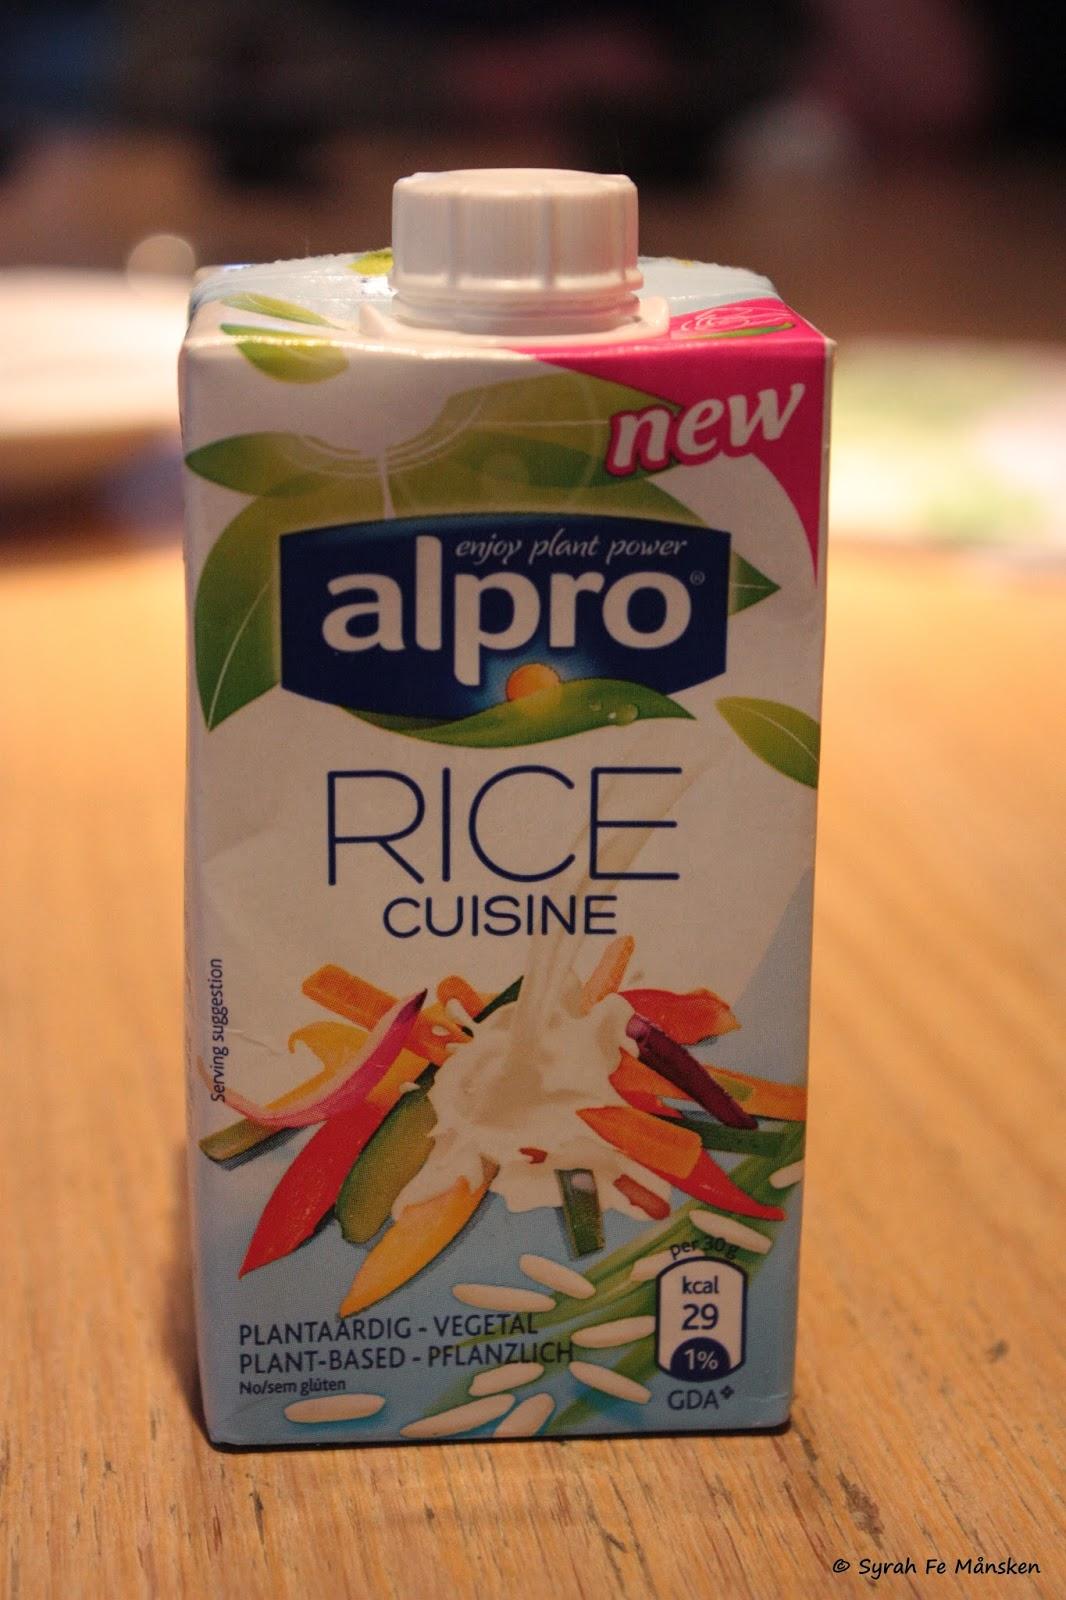 Vegan tagein tagaus neu alpro rice cuisine for Alpro soja cuisine